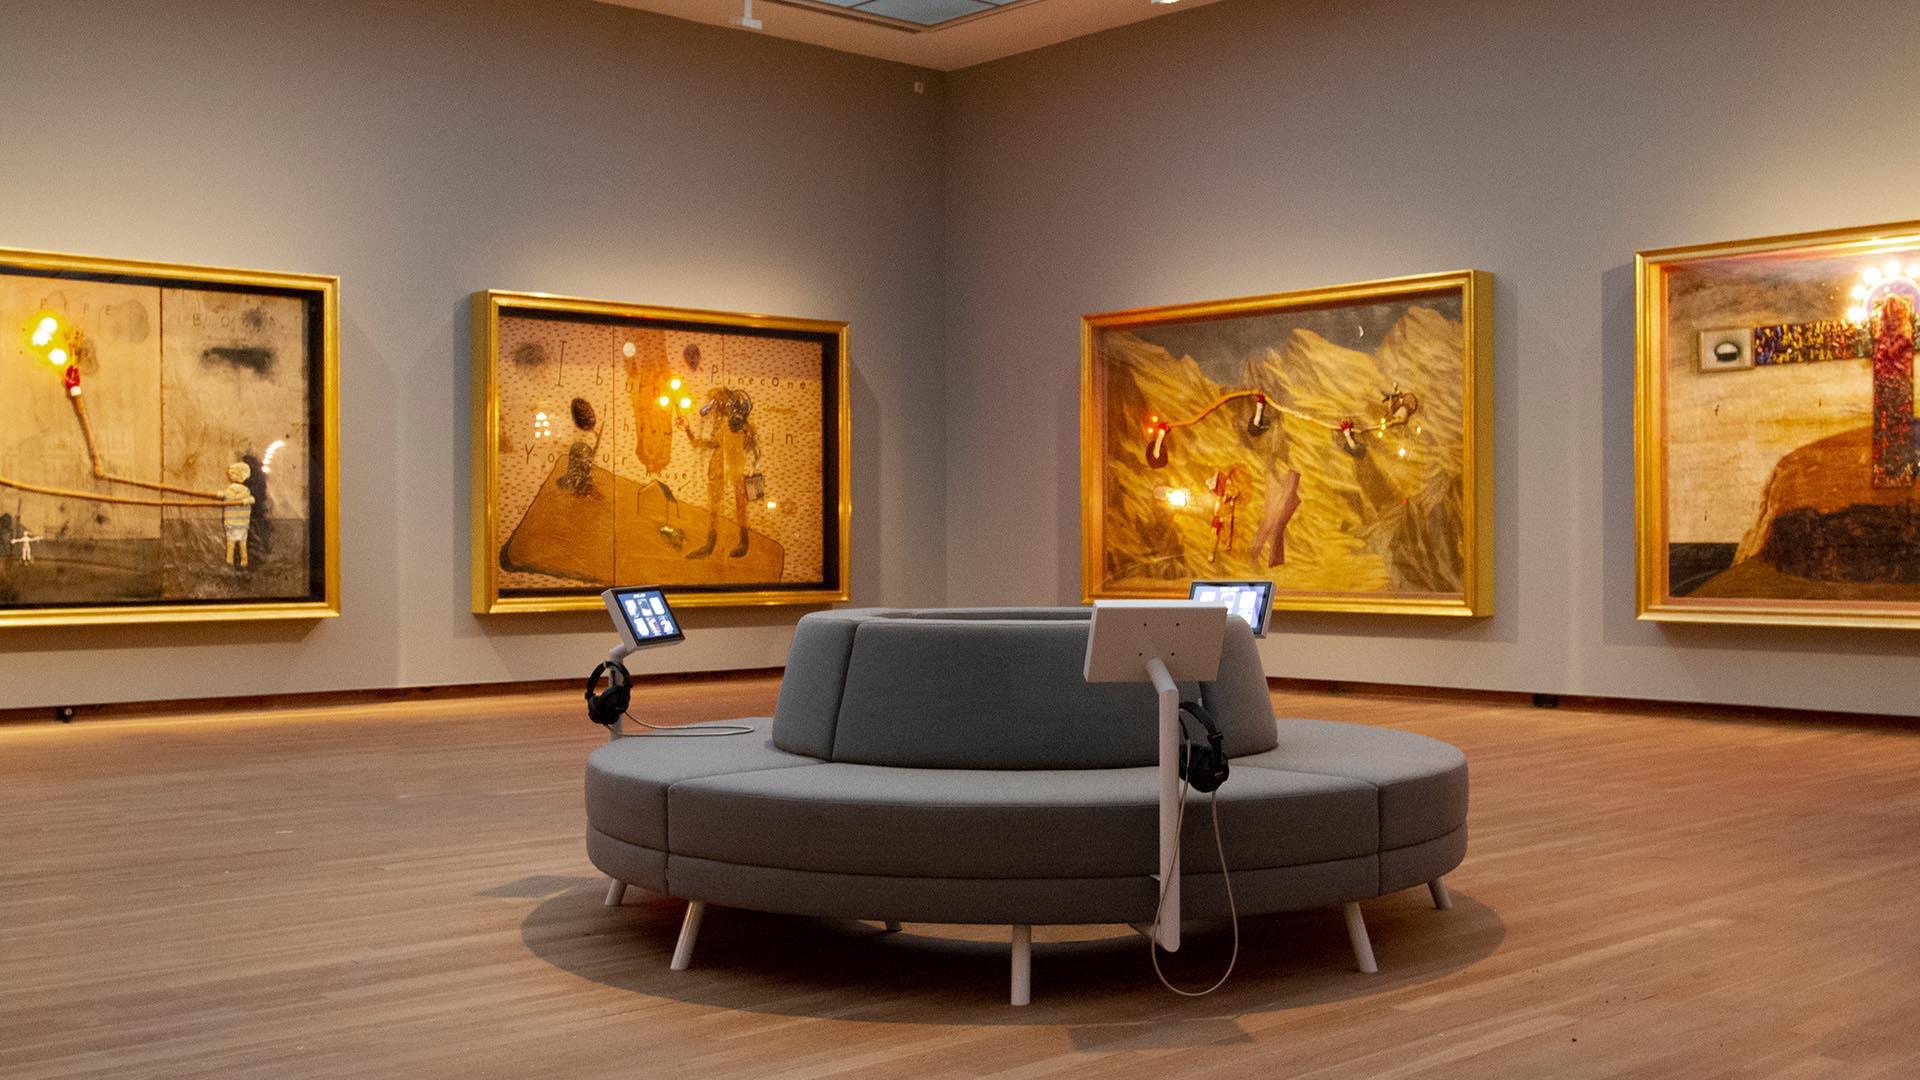 Interactieve zitmeubel David Lynch Bonnefantenmuseum tentoonstelling interactief